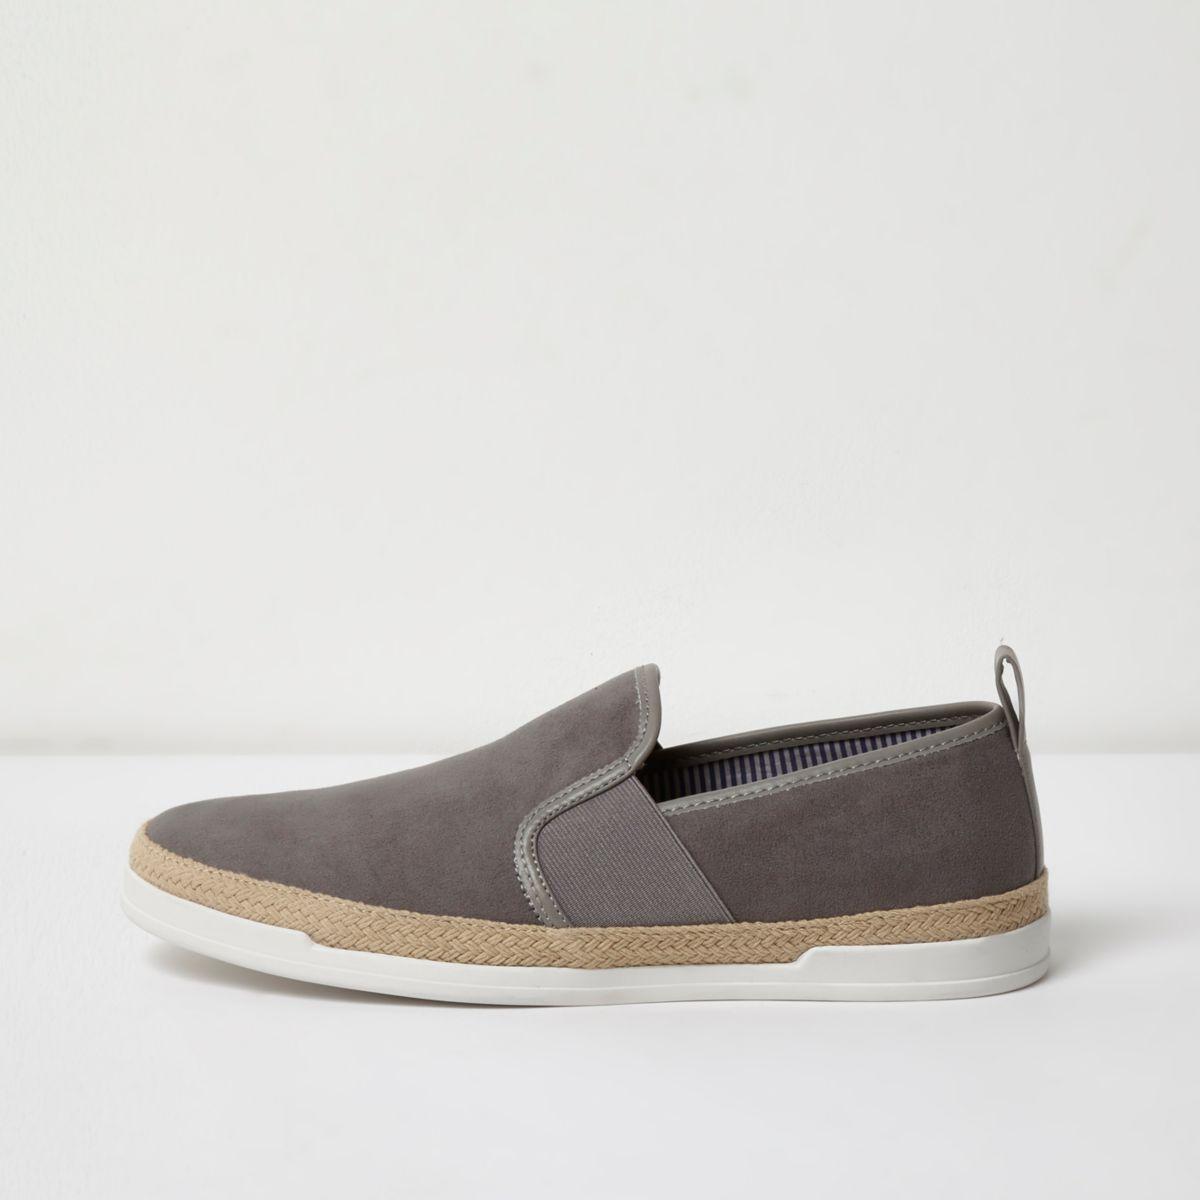 Grey espadrille trim slip on plimsolls